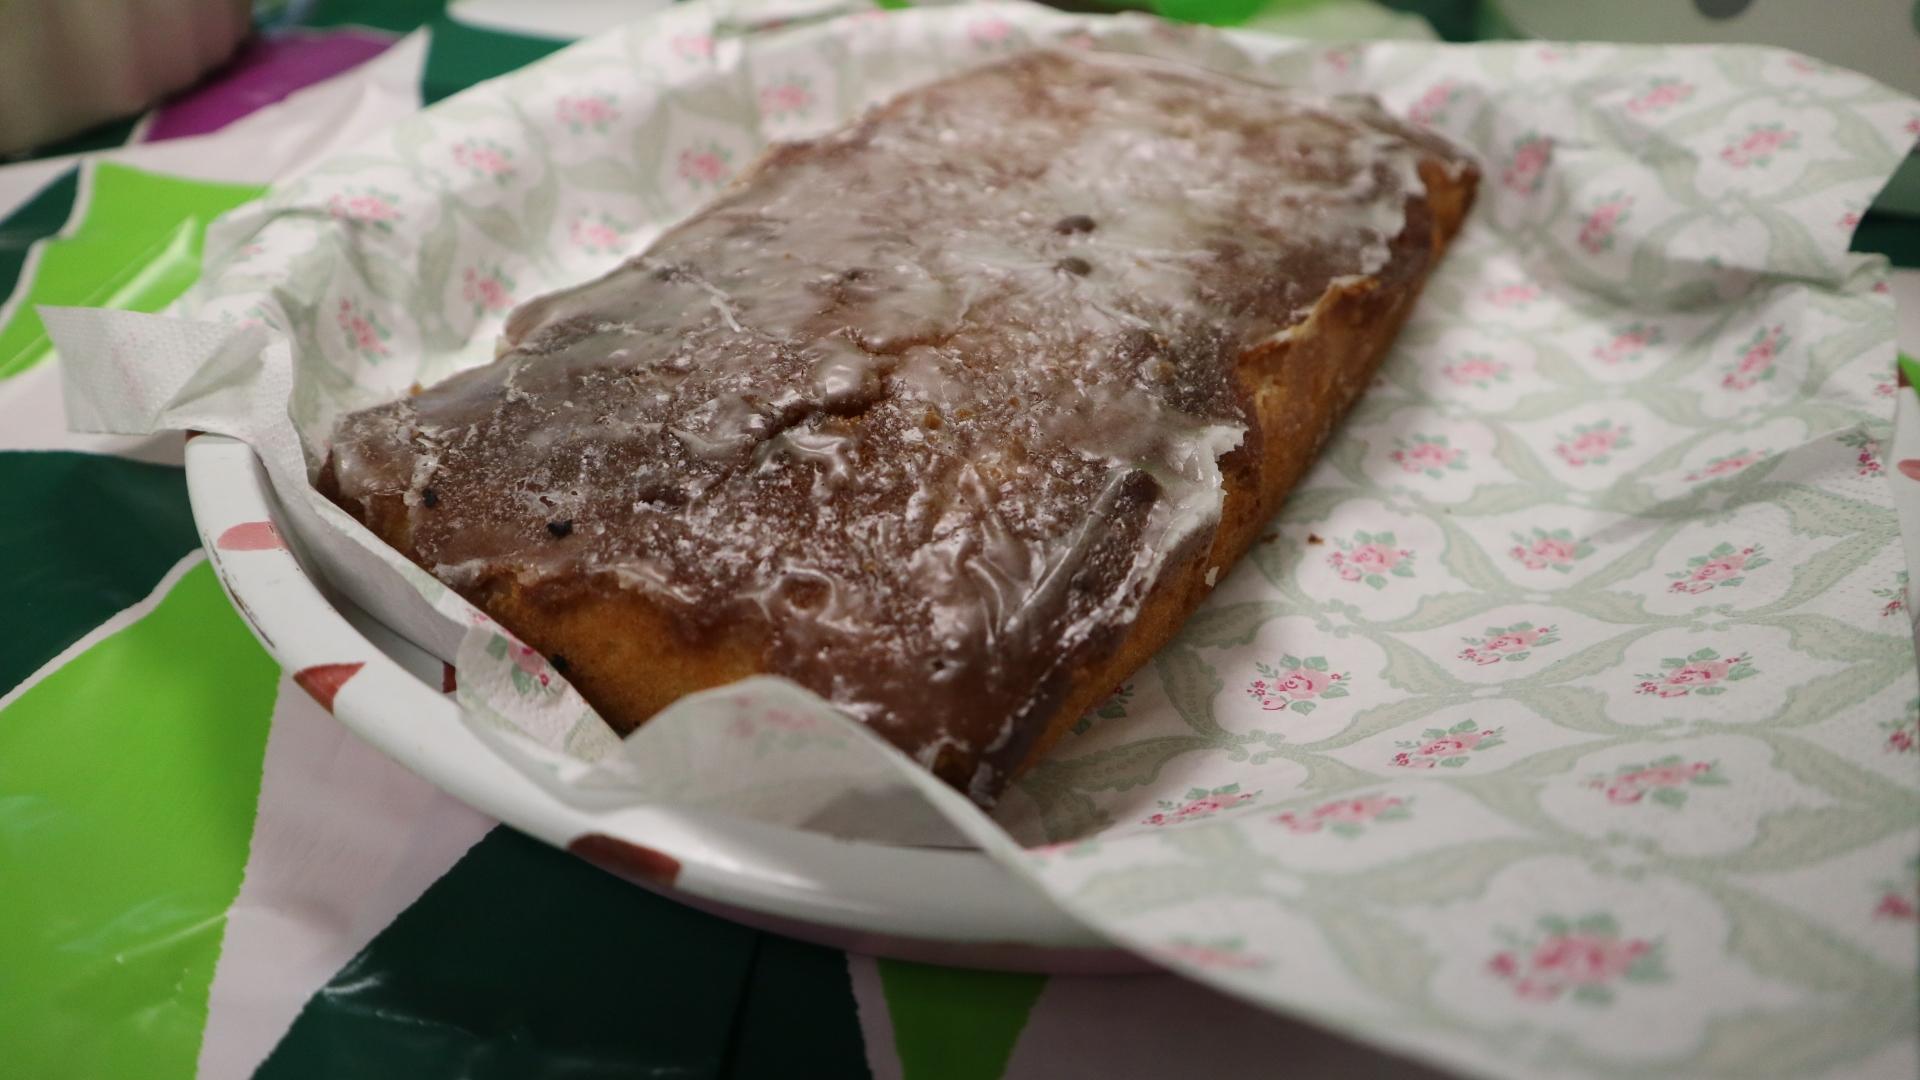 Macmillan Coffee Morning Lemon Drizzle Cake